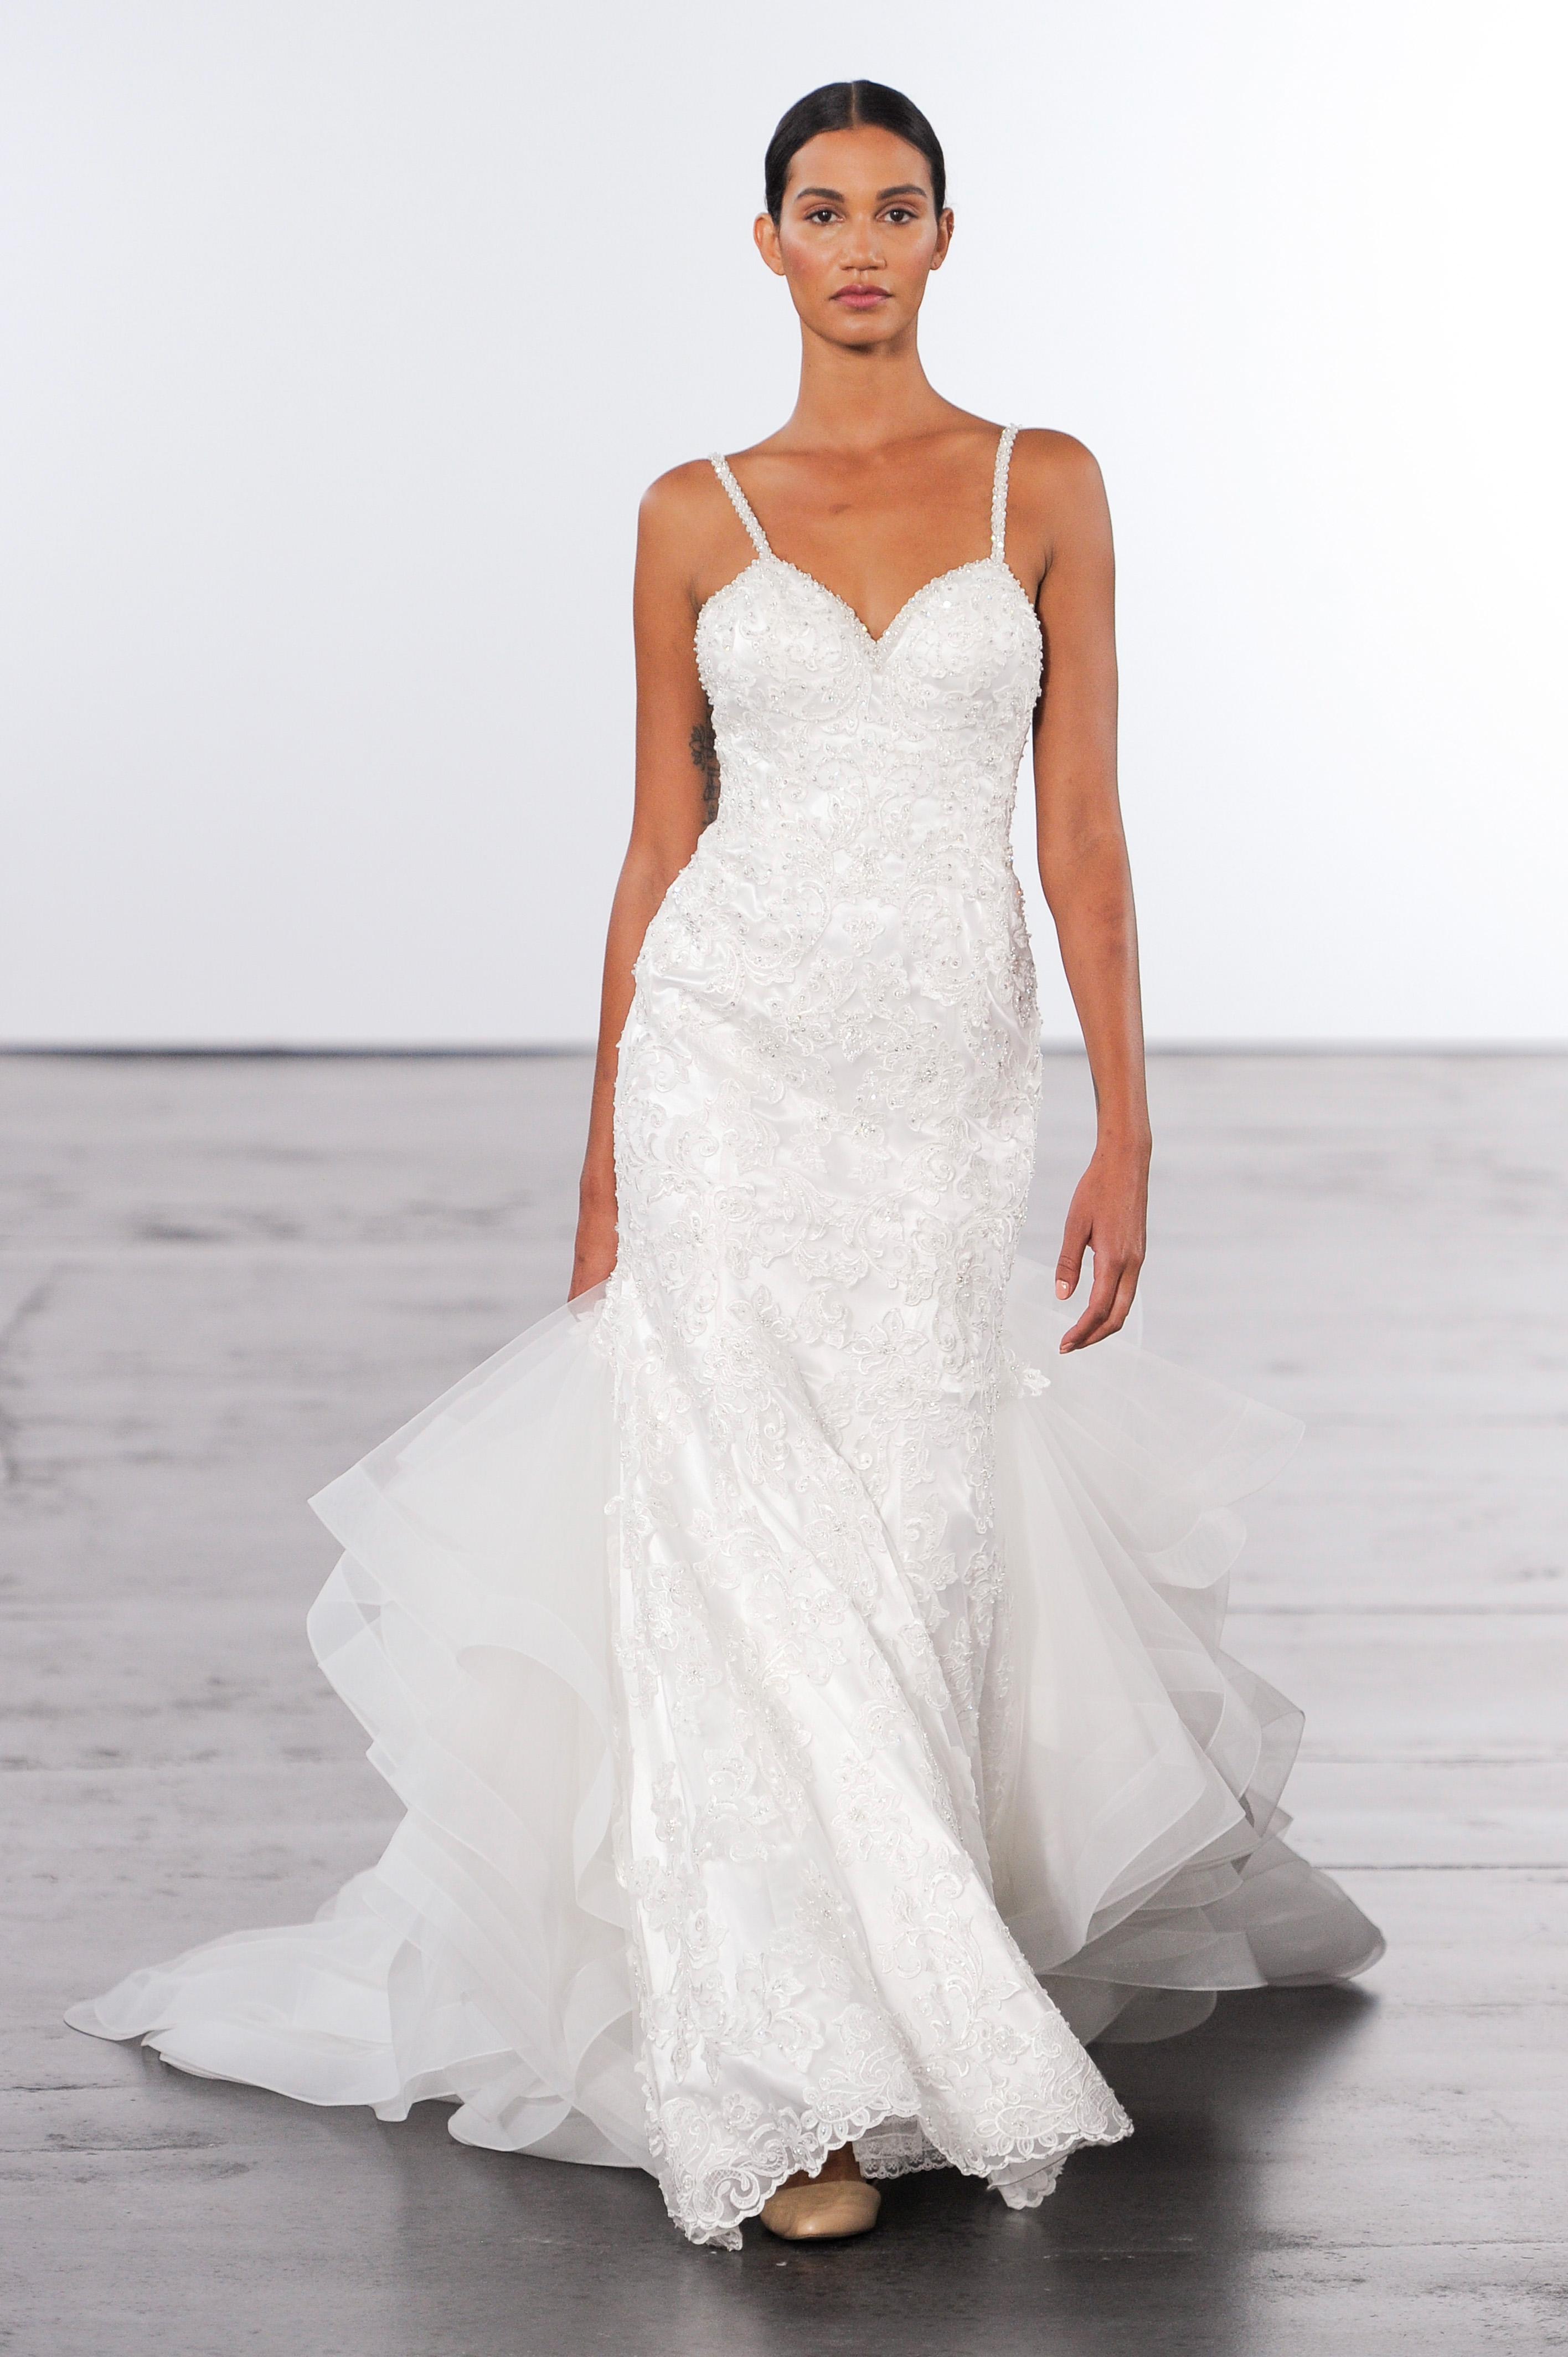 dennis basso lace wedding dress with spaghetti straps fall 2018